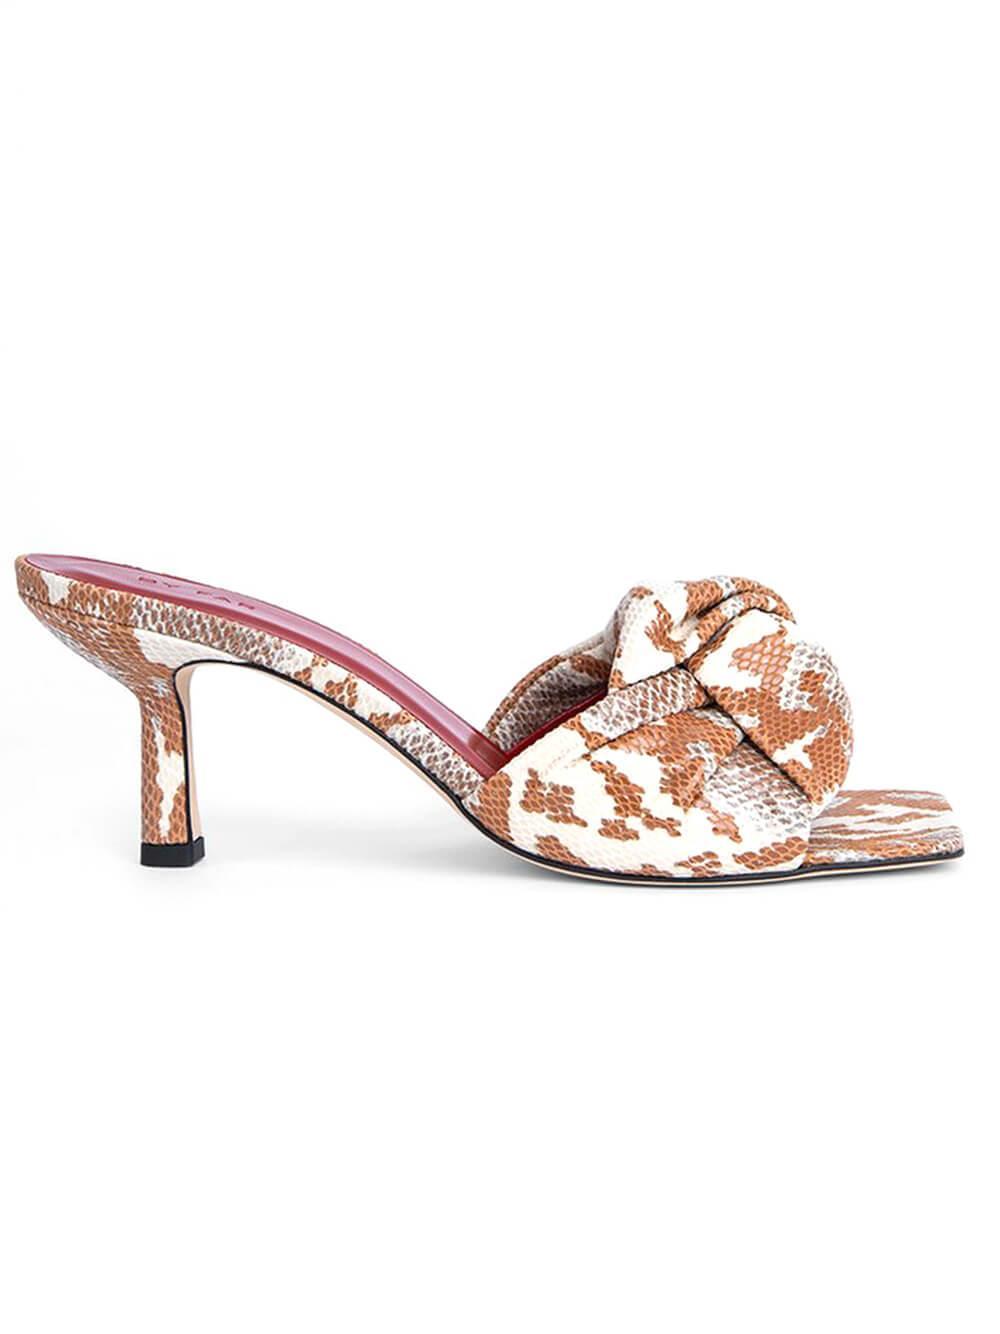 Lana Snake Print Sandal Item # 21PFLAMALMR